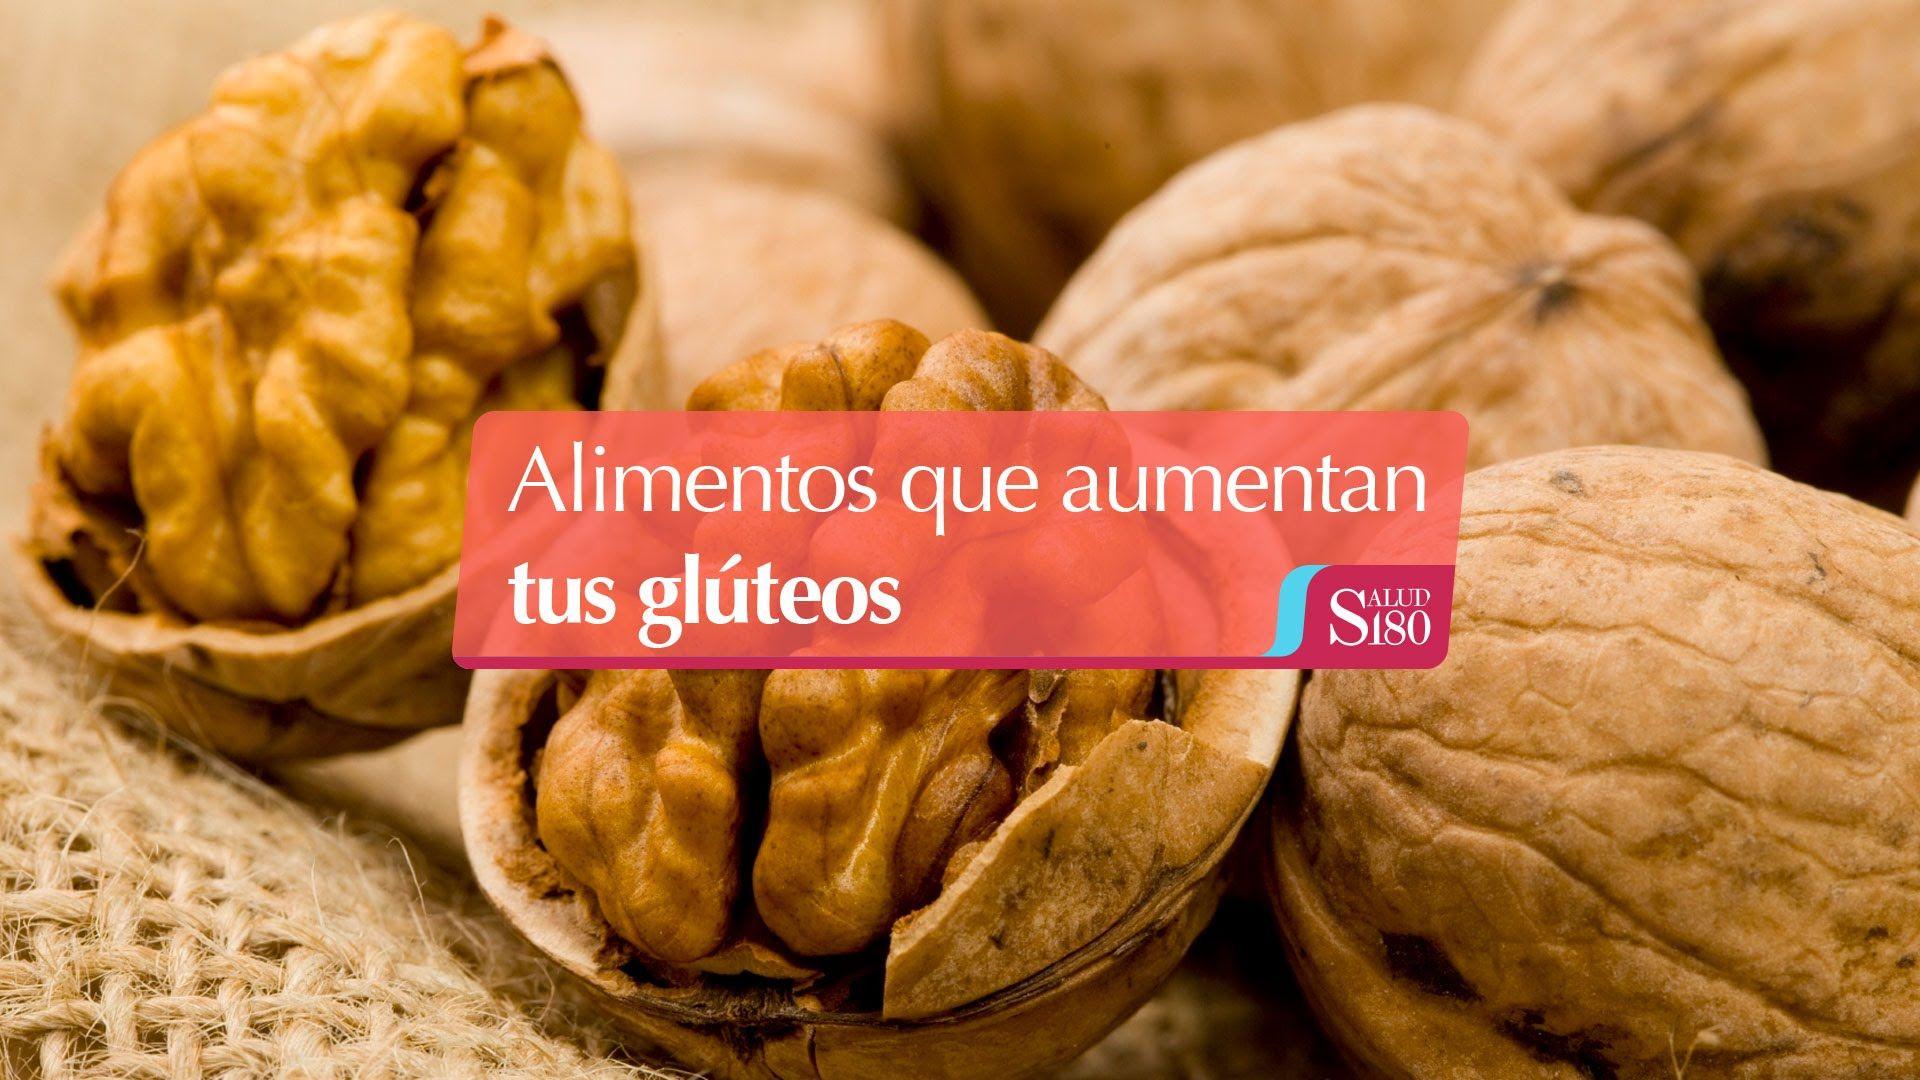 Aumenta tus glúteos sin engordar | Transfórmate | Salud180